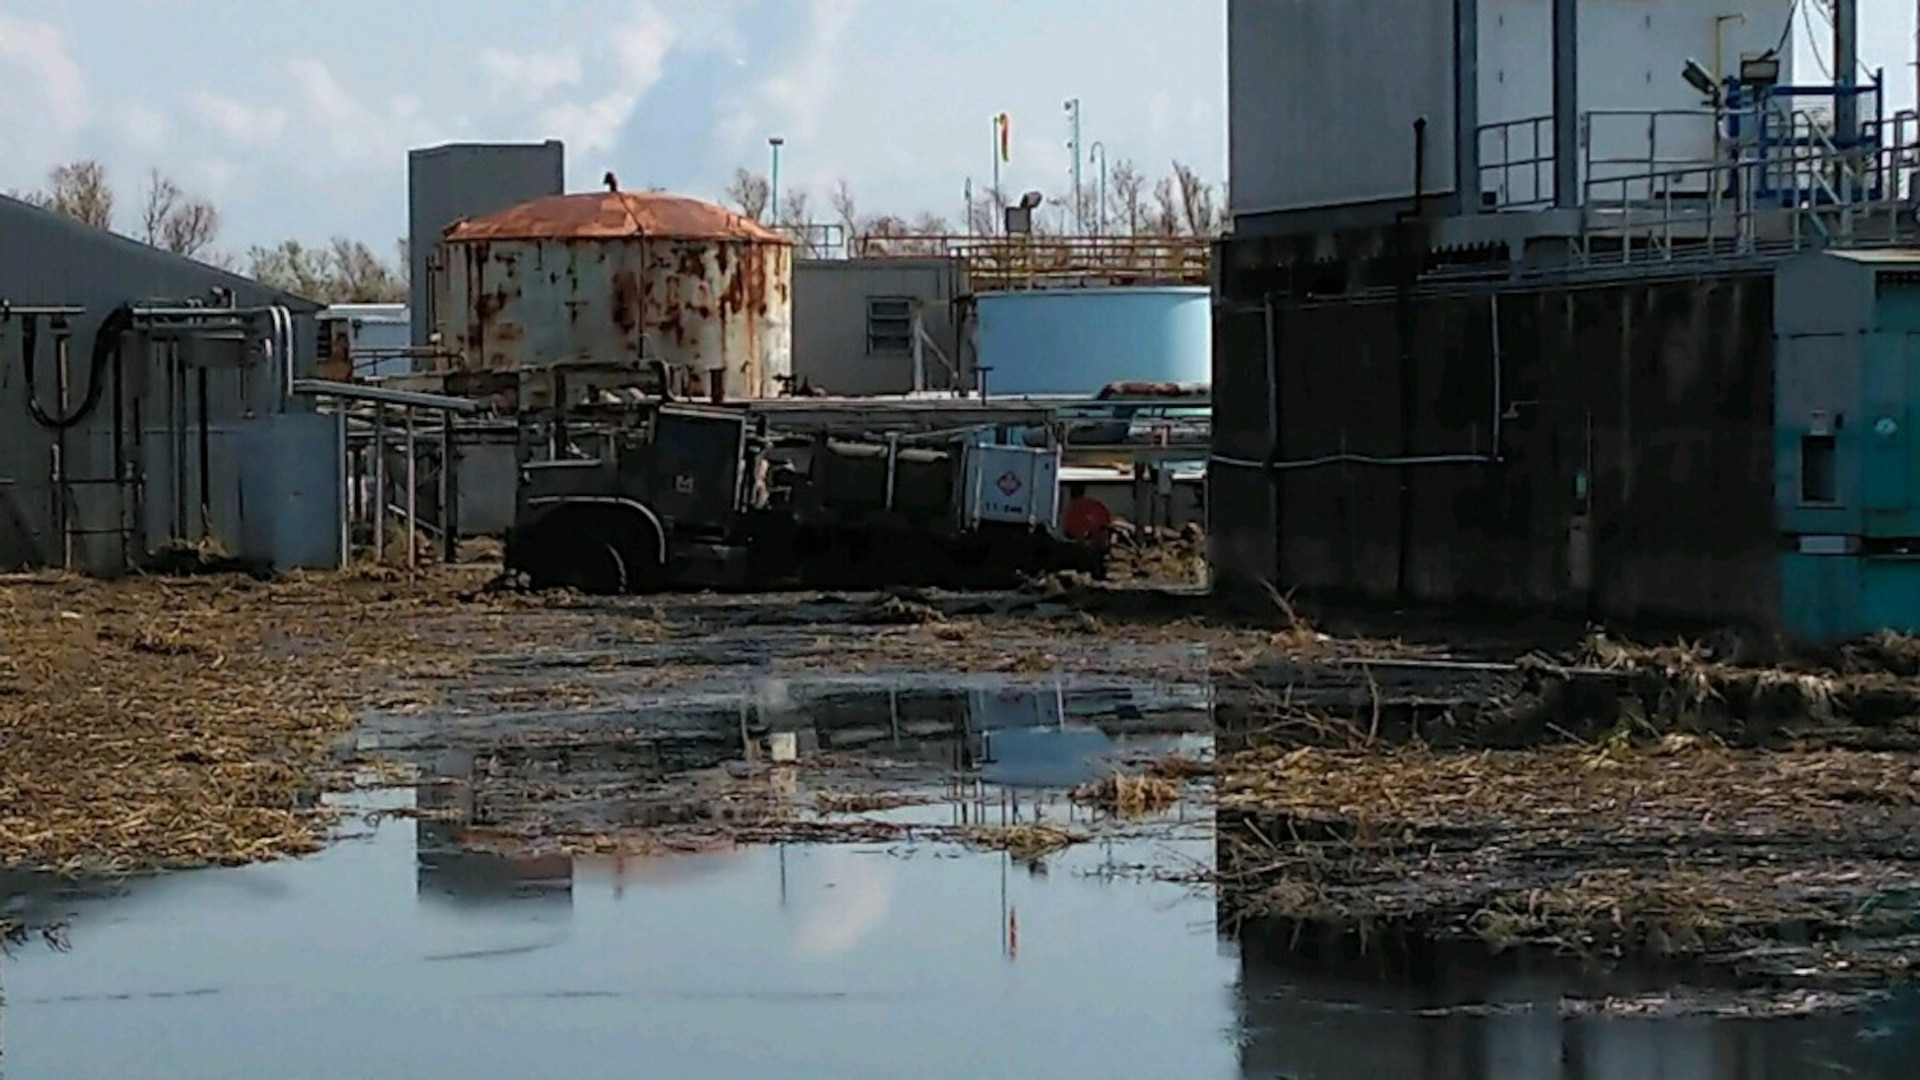 a high water truck stuck in hurricane debris